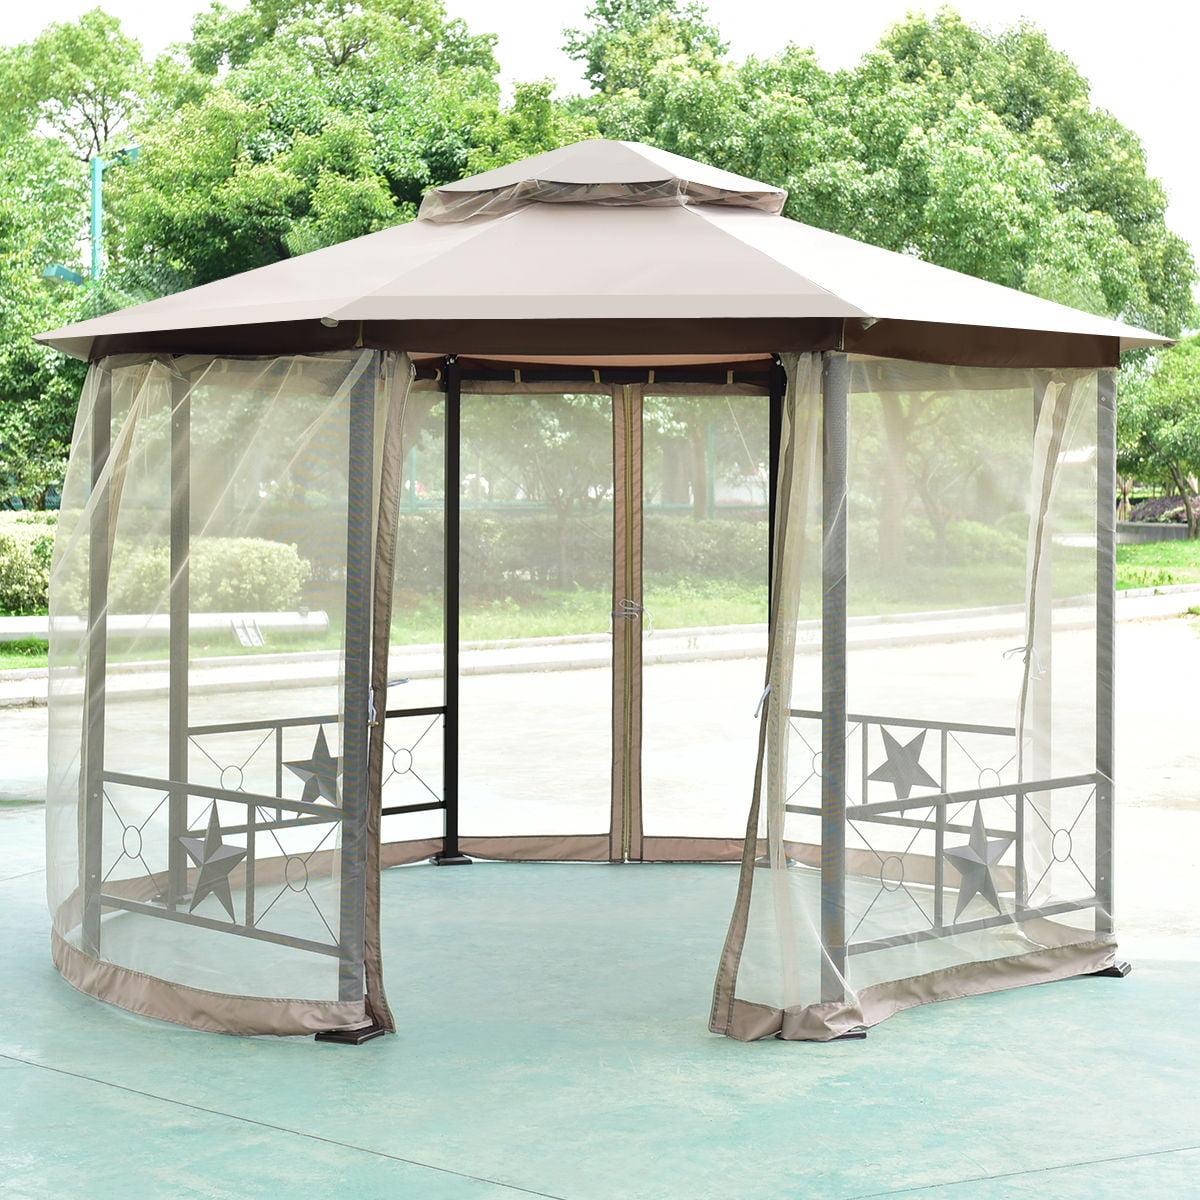 Costway Octagon 2-Tier 12.5ft Outdoor Gazebo Canopy Shelt...